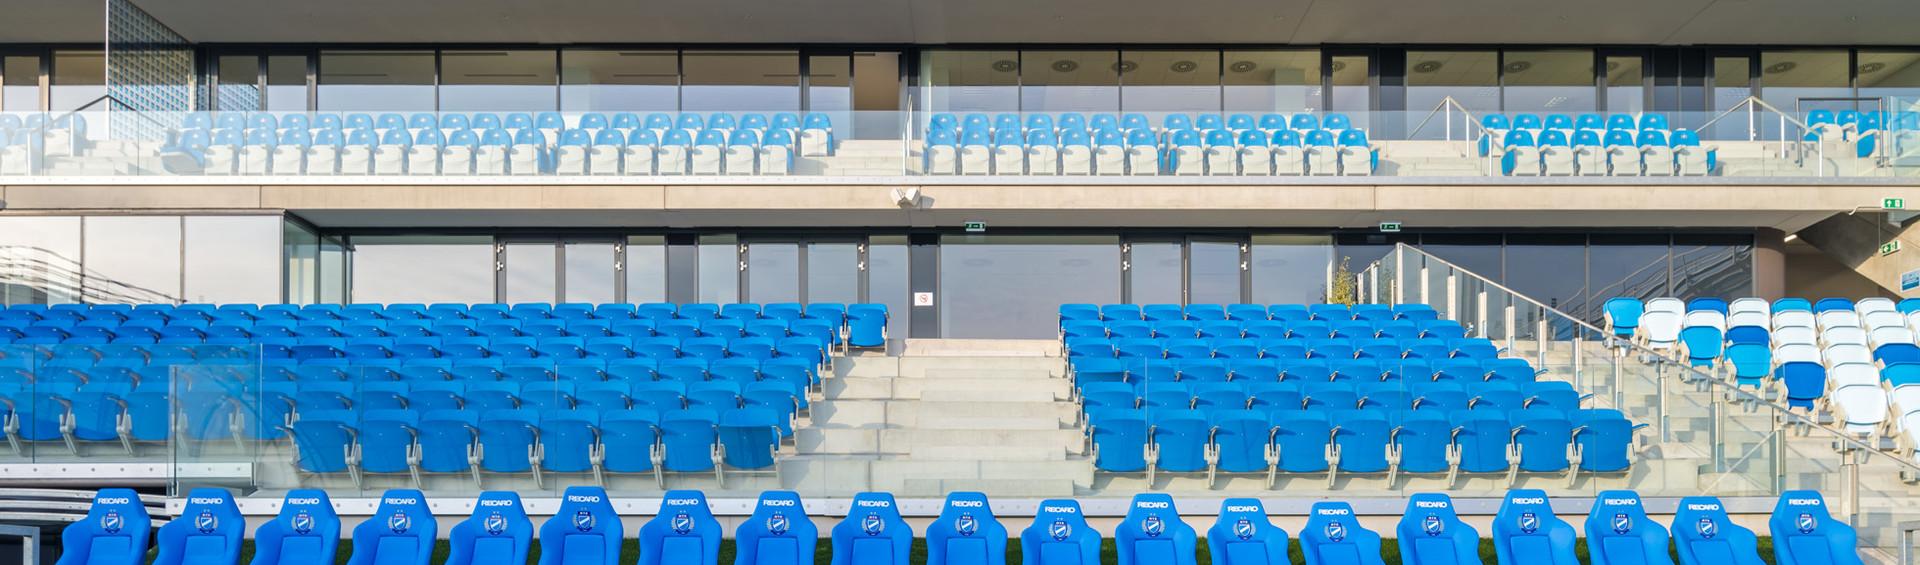 MTK_Stadion_PGY-73.jpg